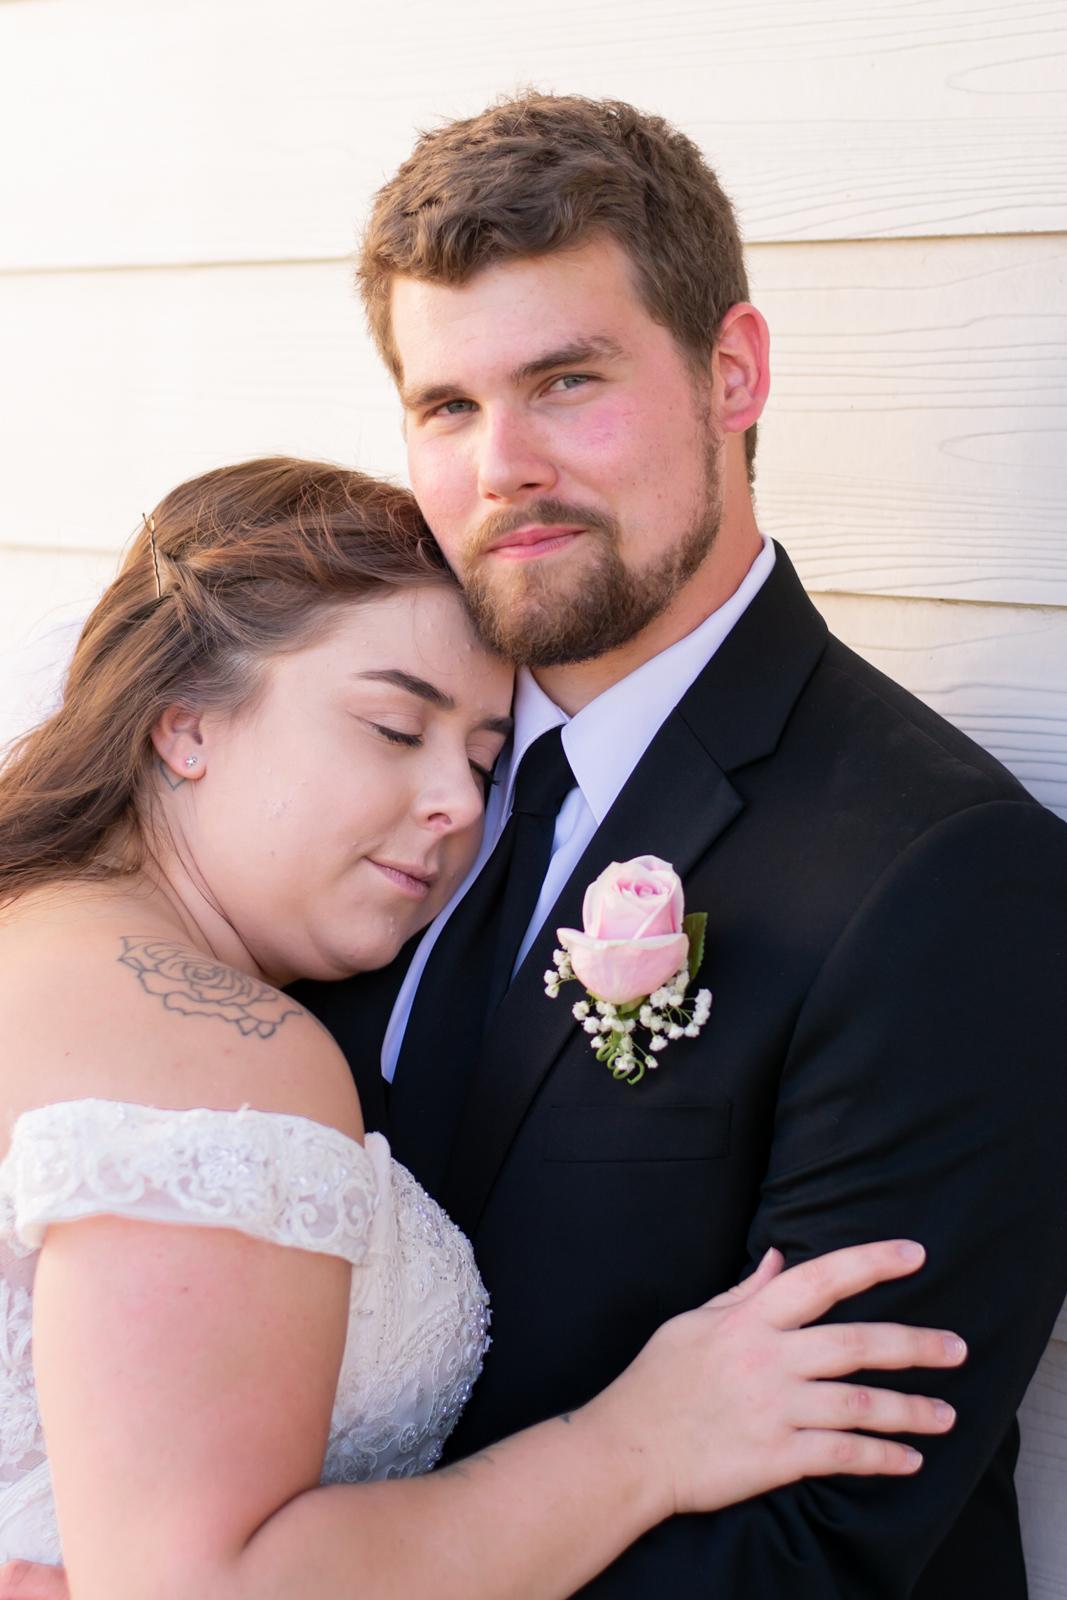 wedding-photography-vancouver-washington-groom